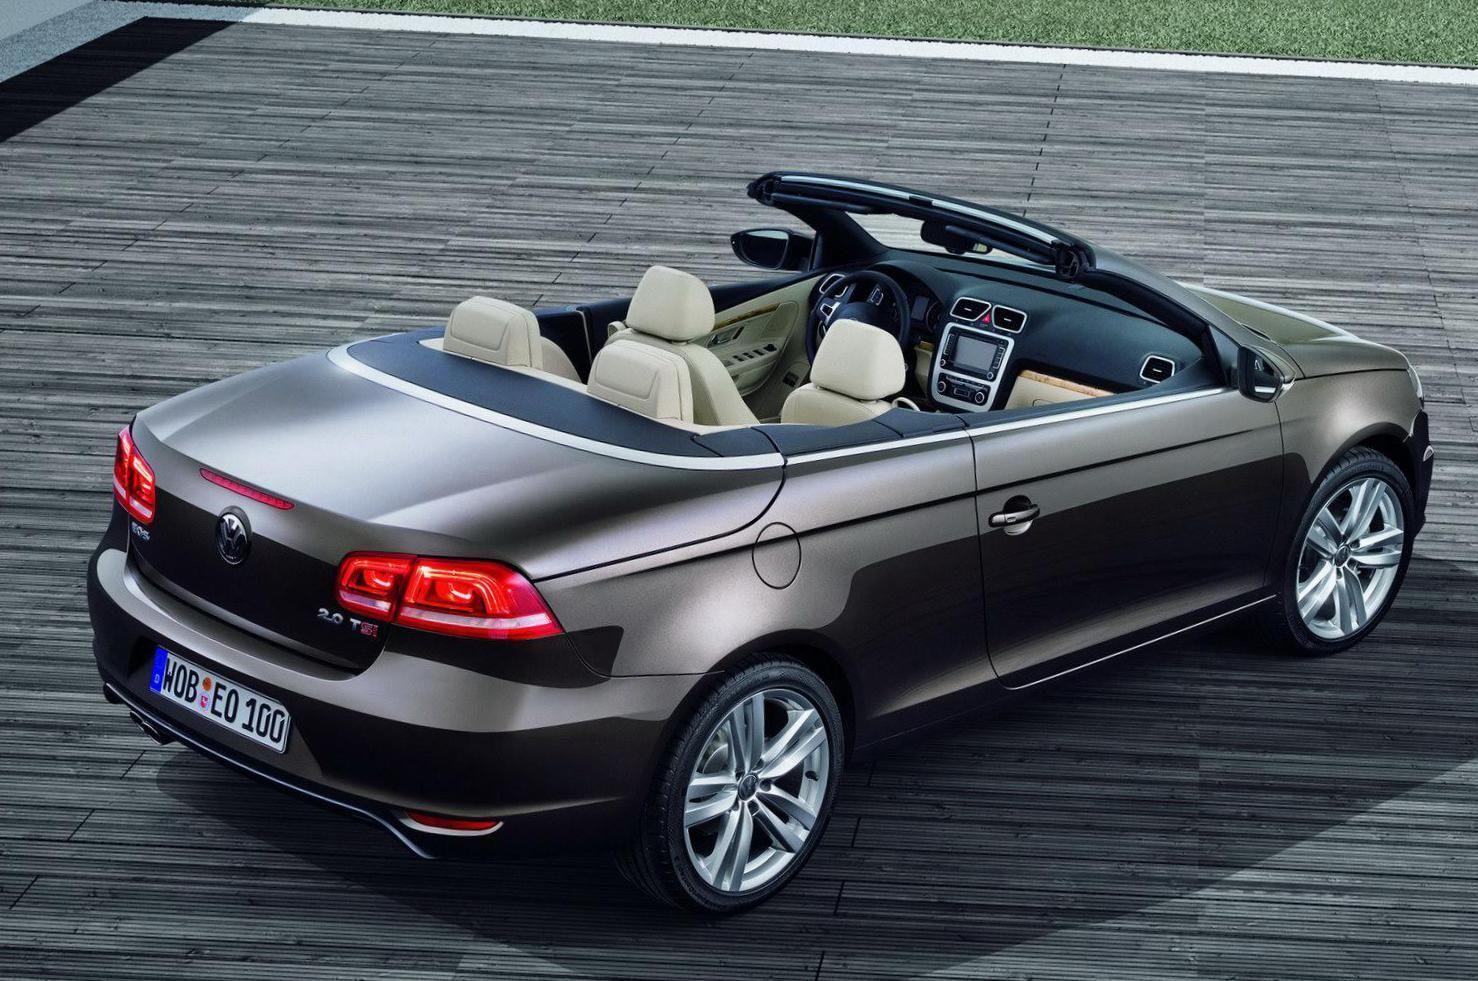 Volkswageneos Car Insurance Vw Eos Volkswagen